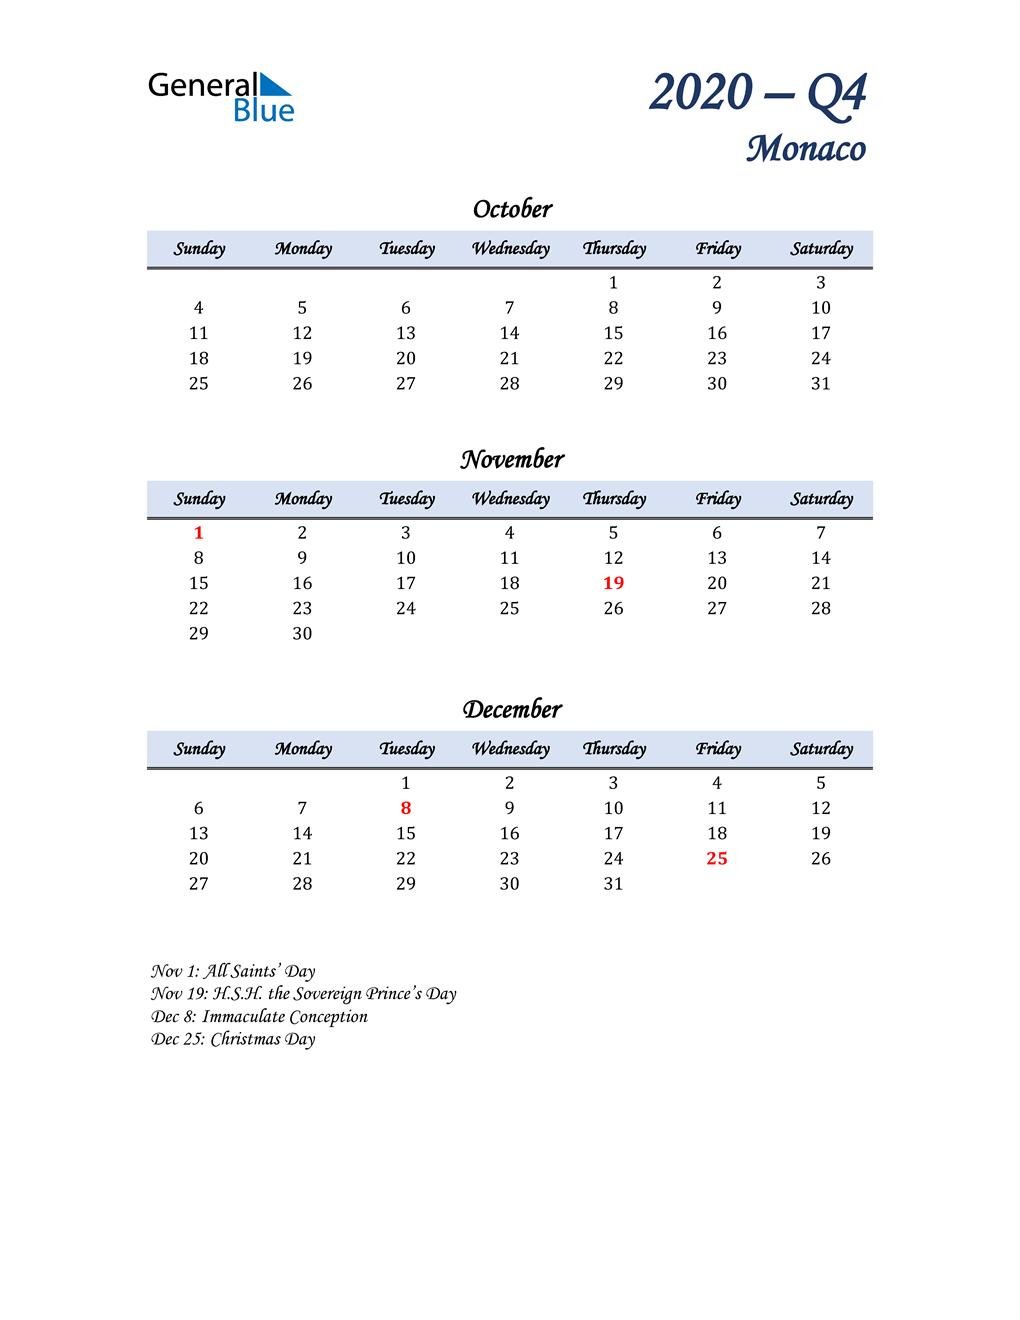 October, November, and December Calendar for Monaco